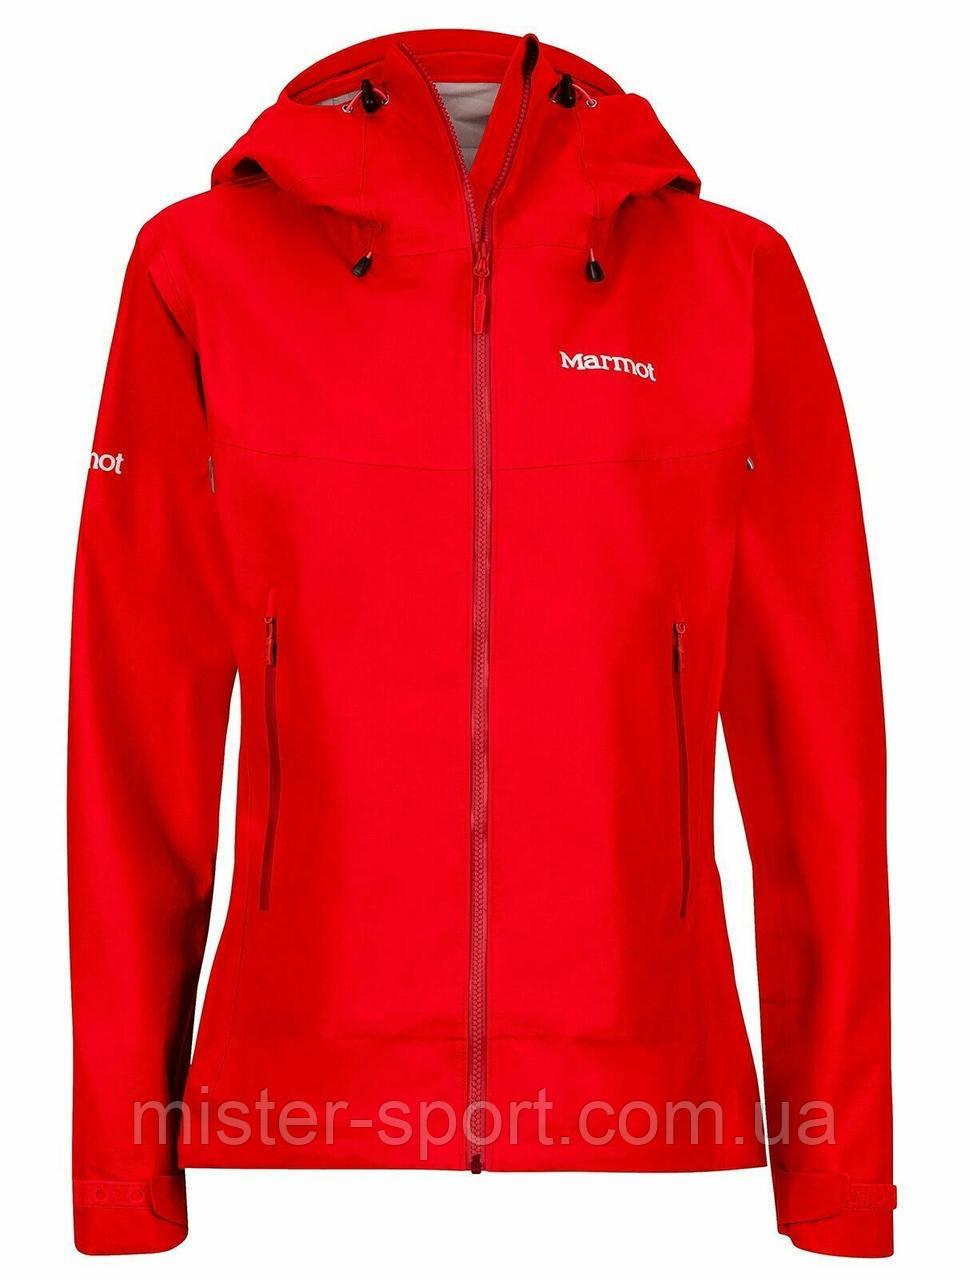 Жіноча куртка Marmot women's Starfire Lightweight Waterproof Rain Jacket, розмір M